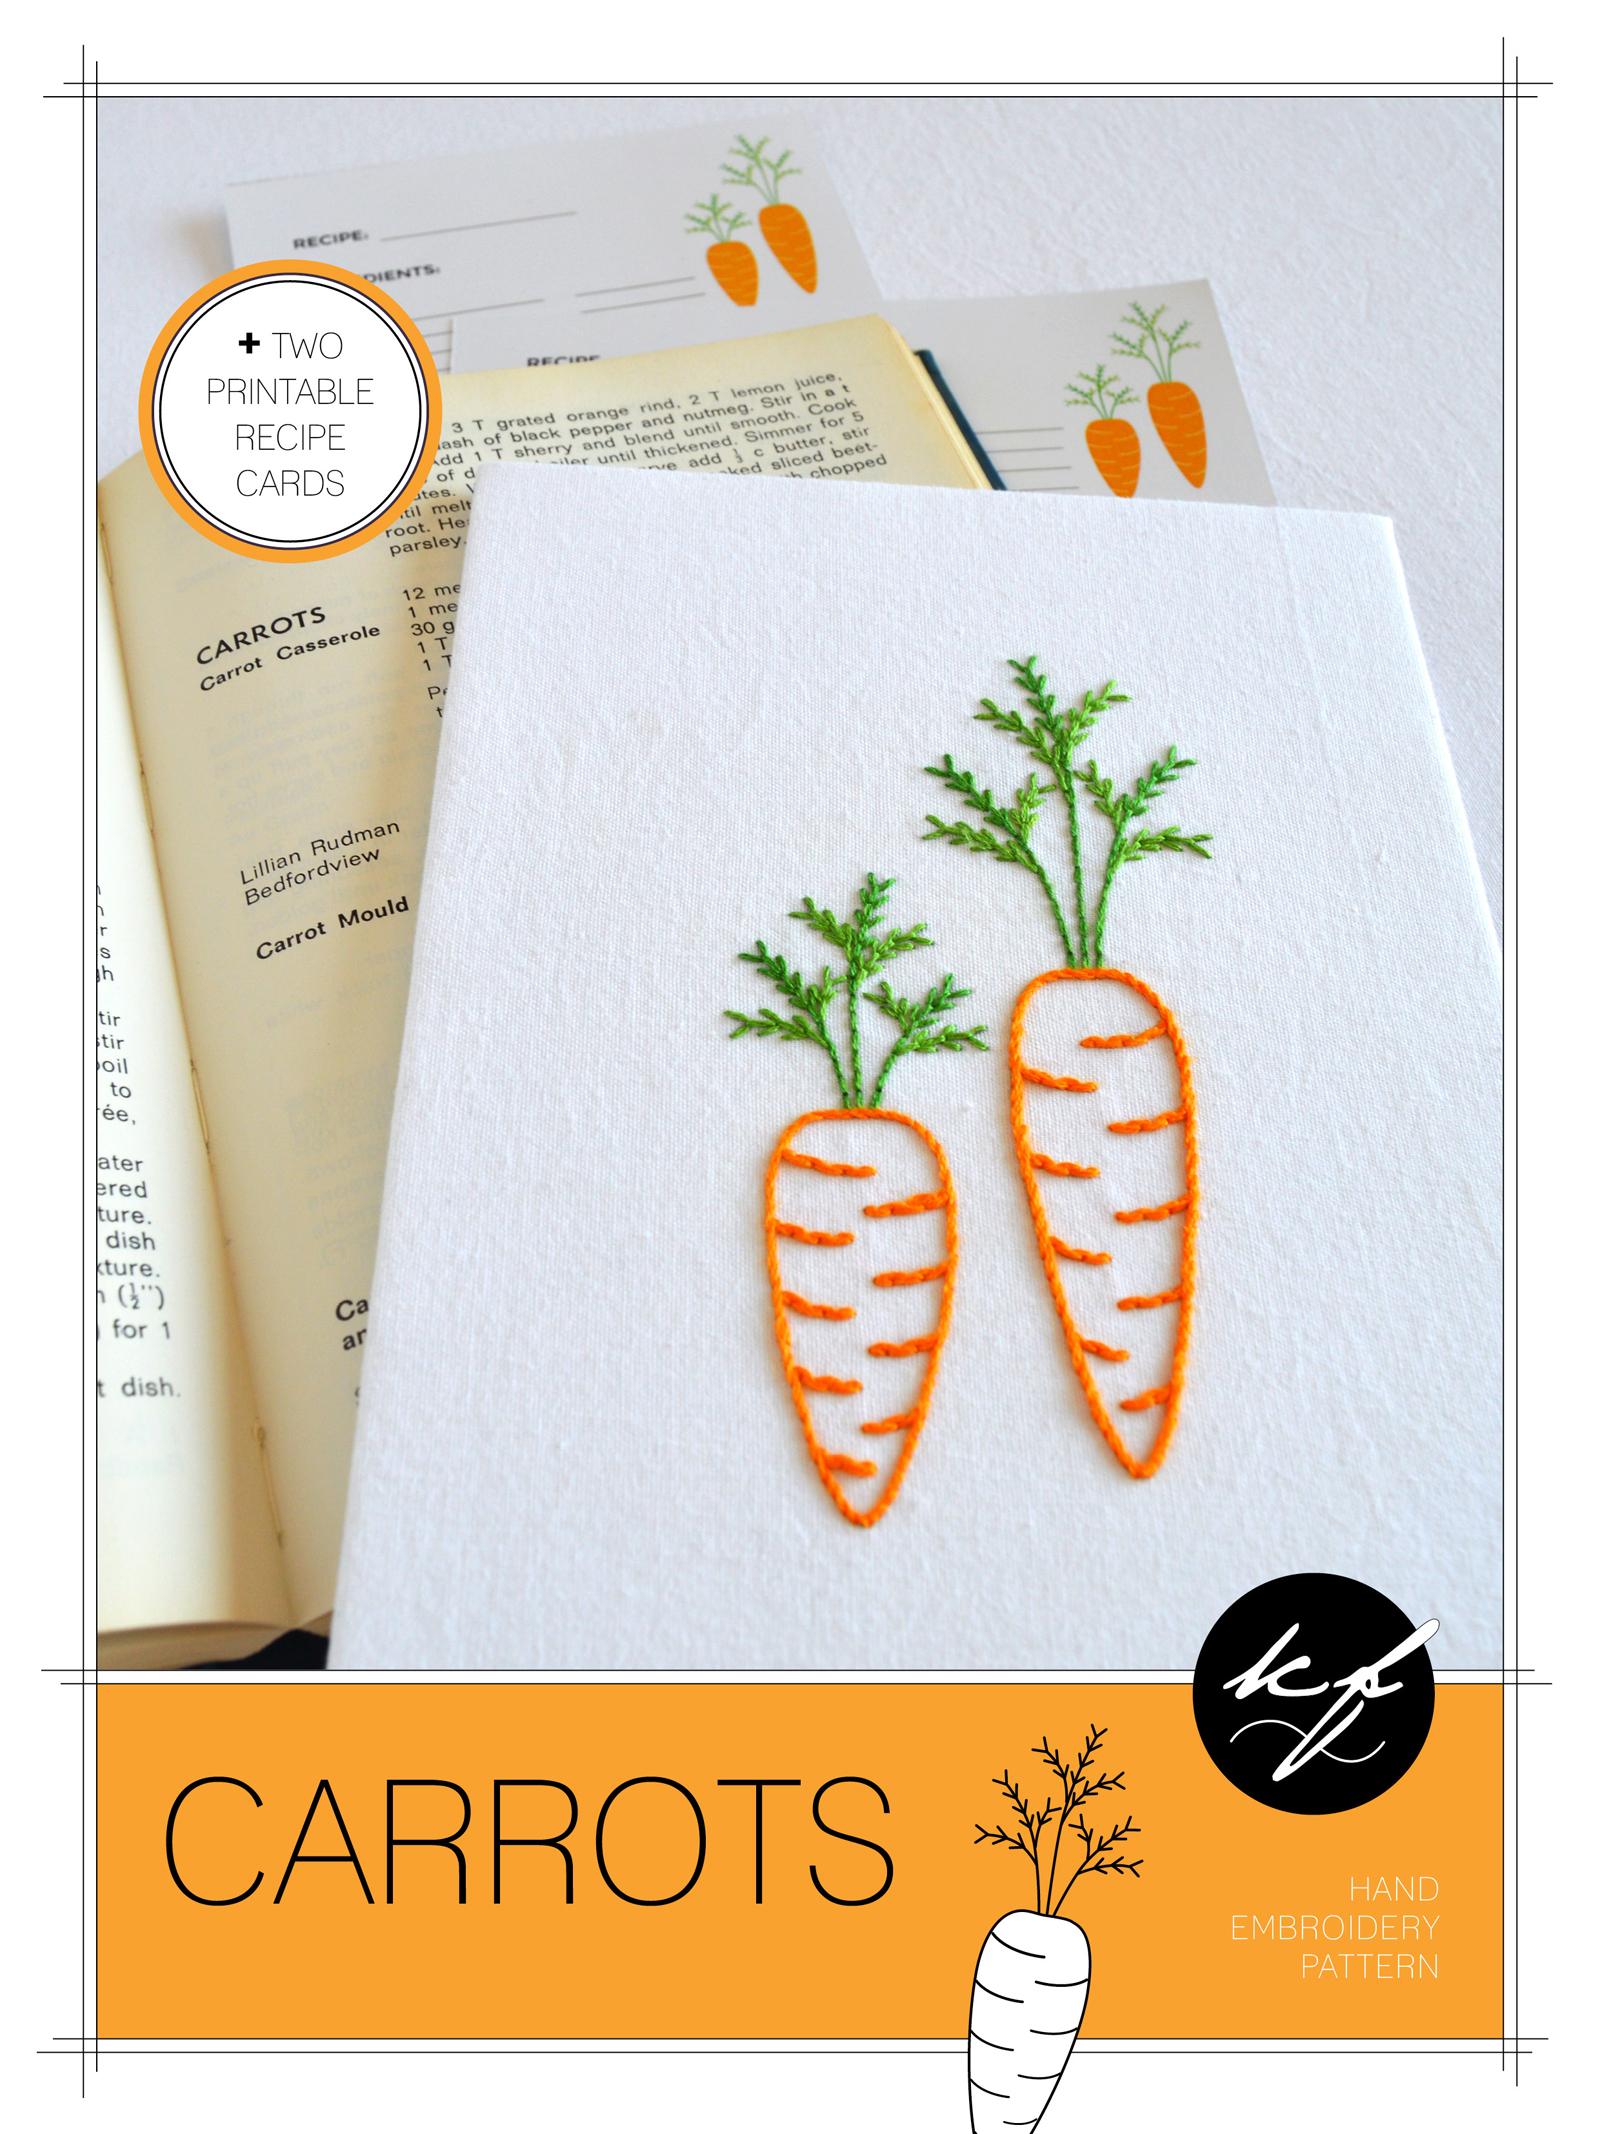 CarrotsEmbroideryPattern_KellyFletcher.jpg